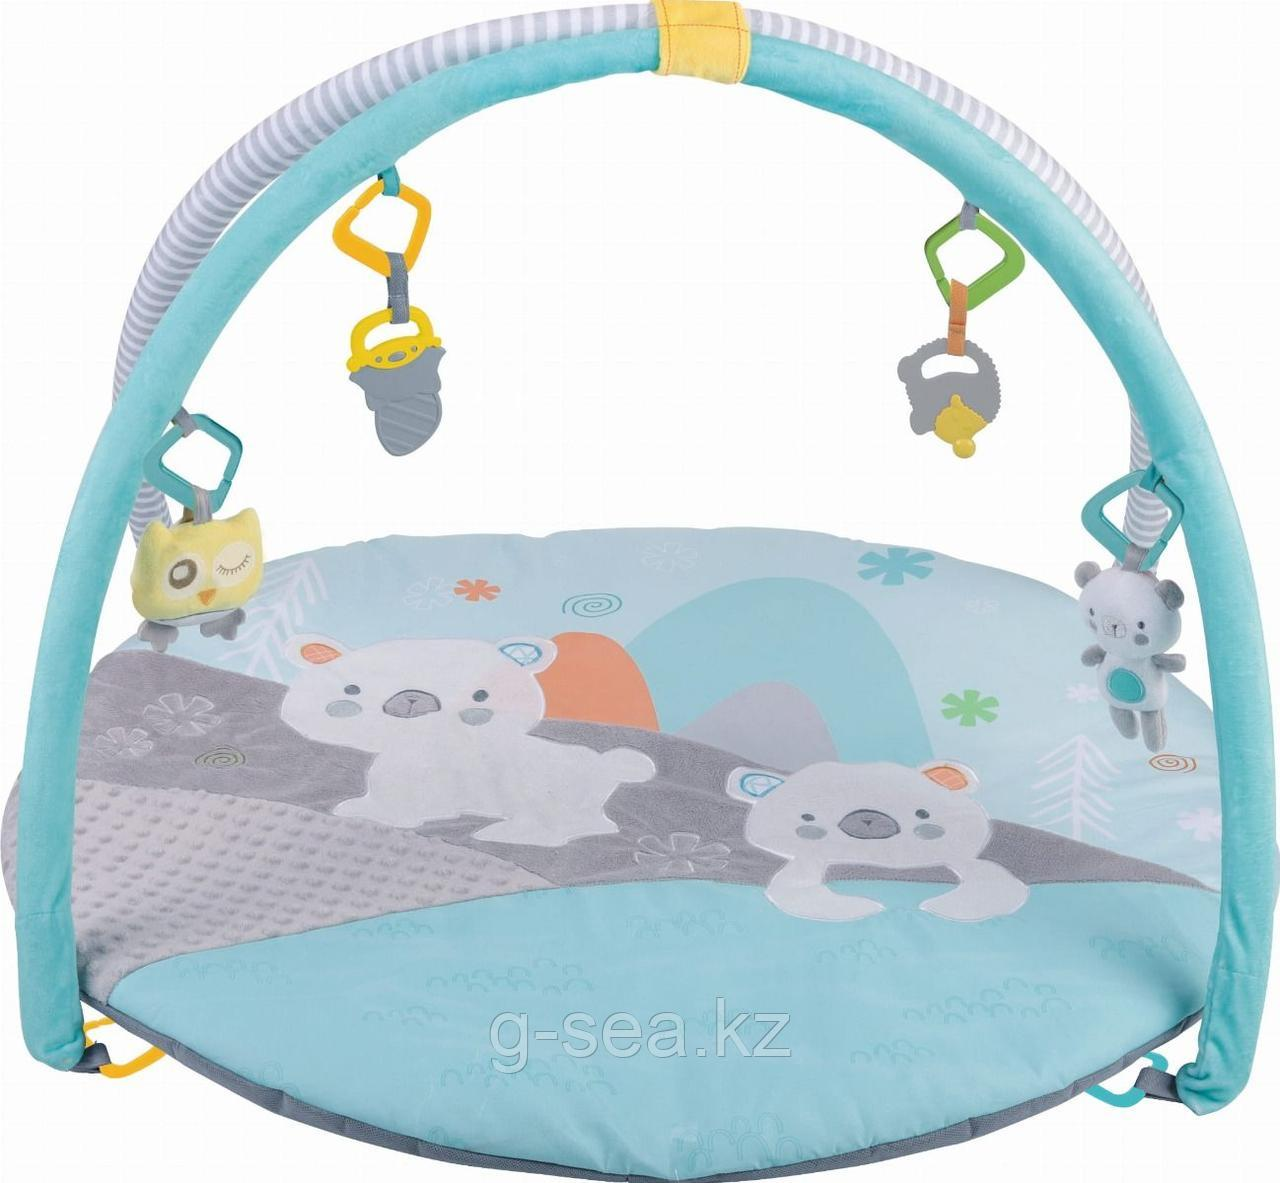 Konig Kids: Игровой коврик Ultra Large & Soft